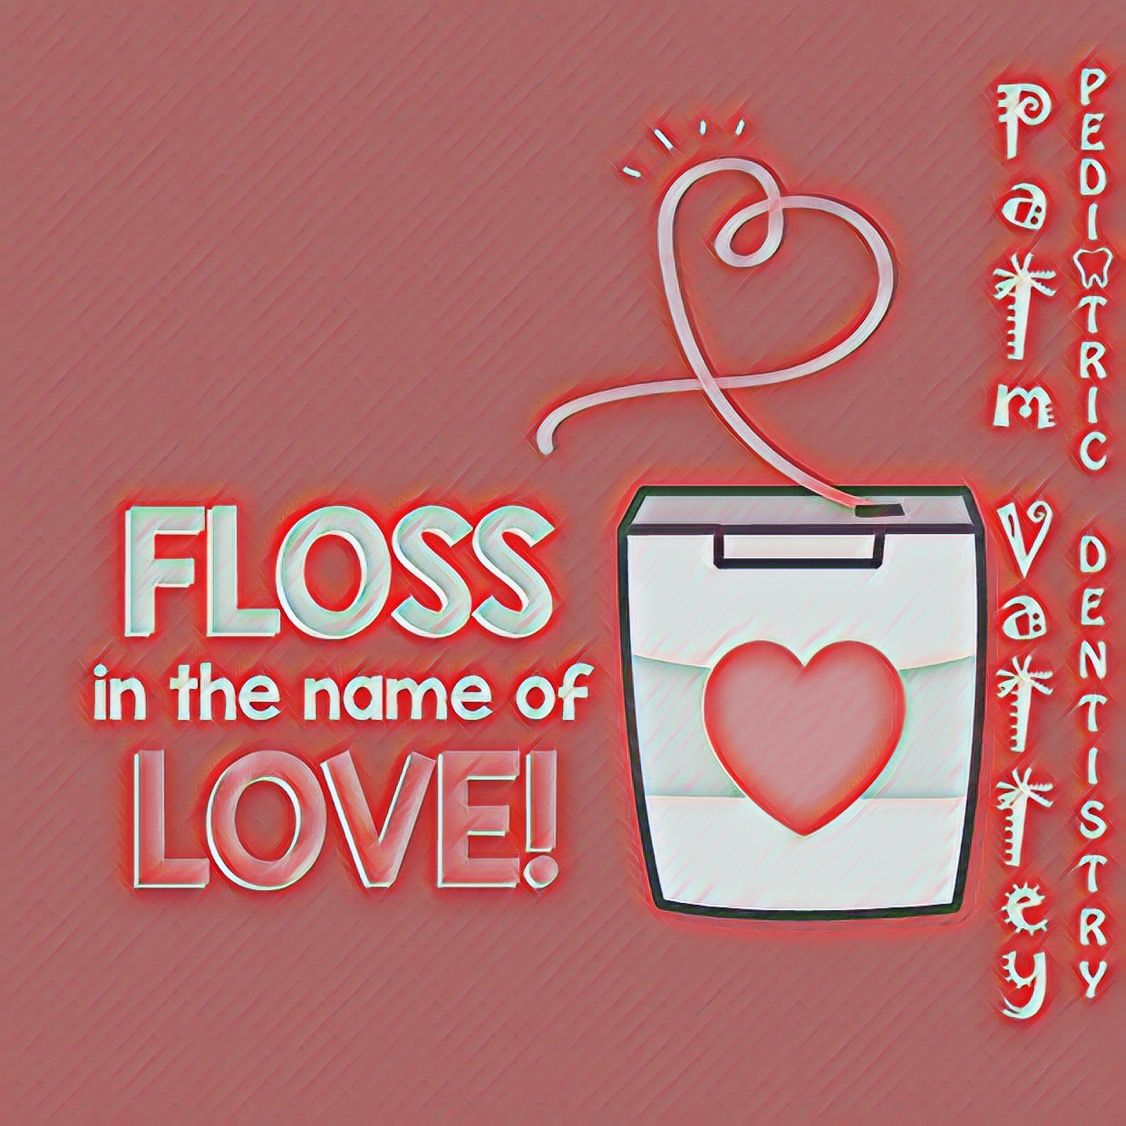 SHOW YOUR SMILE some love by remembering to floss!  Happy Friday everyone!   Palm Valley Pediatric Dentistry    www.pvpd.com #pvpd #kid #child #children #love #cute #sweet #pretty #little #fun #family #baby #happy #smile #dentist #pediatricdentist #goodyear #avondale #surprise #phoenix #phoenixaz #litchfieldpark #verrado #dentalcare #oralhealth #kidsdentist #childrendentist #love #cute